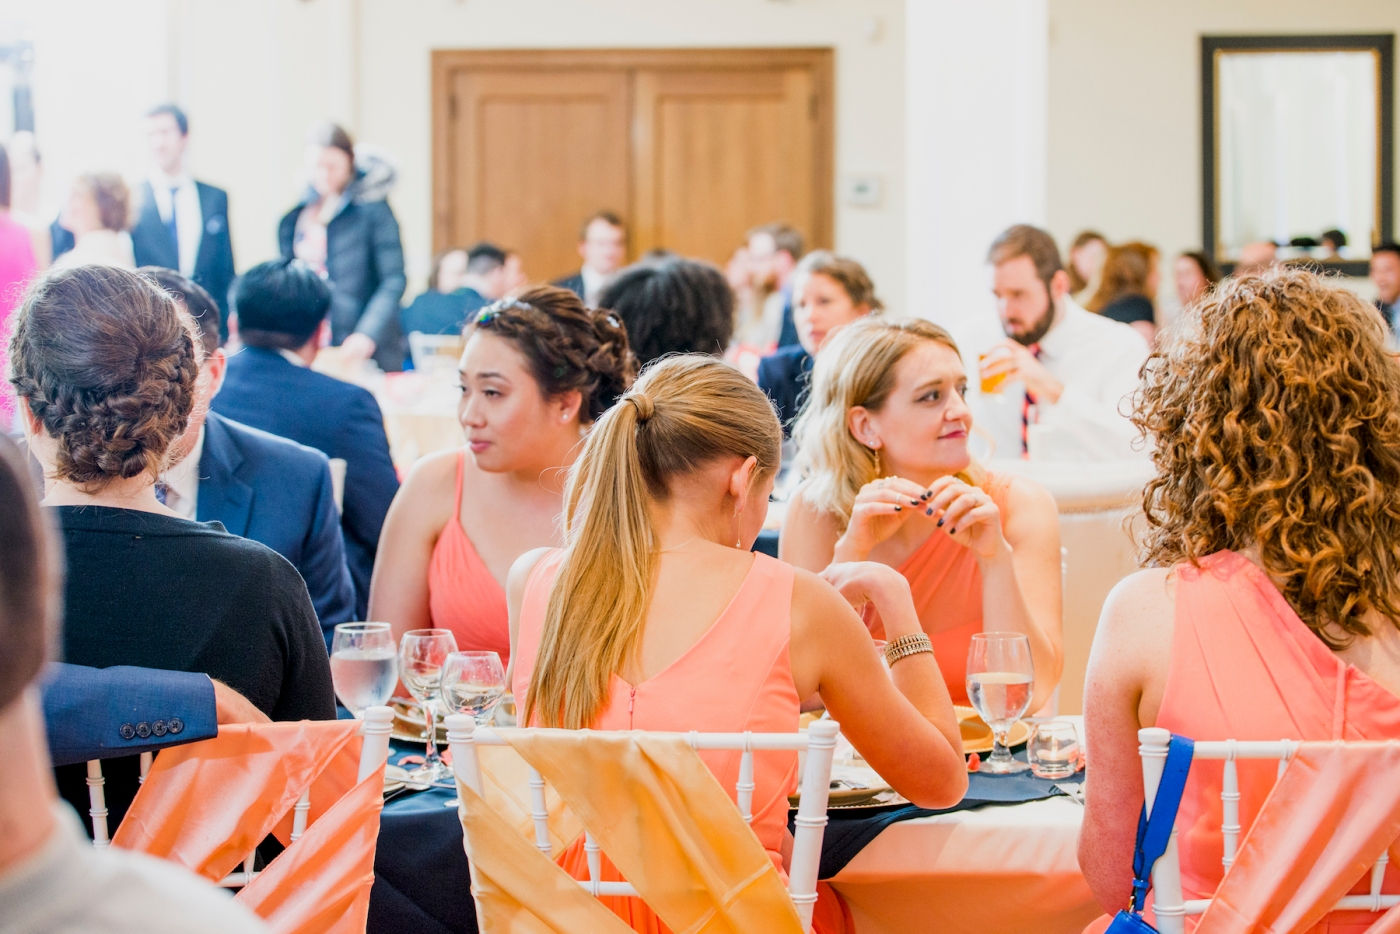 DSC_3223Everett_Wedding_Ballroom_Jane_Speleers_photography_Rachel_and_Edmund_reception_2017